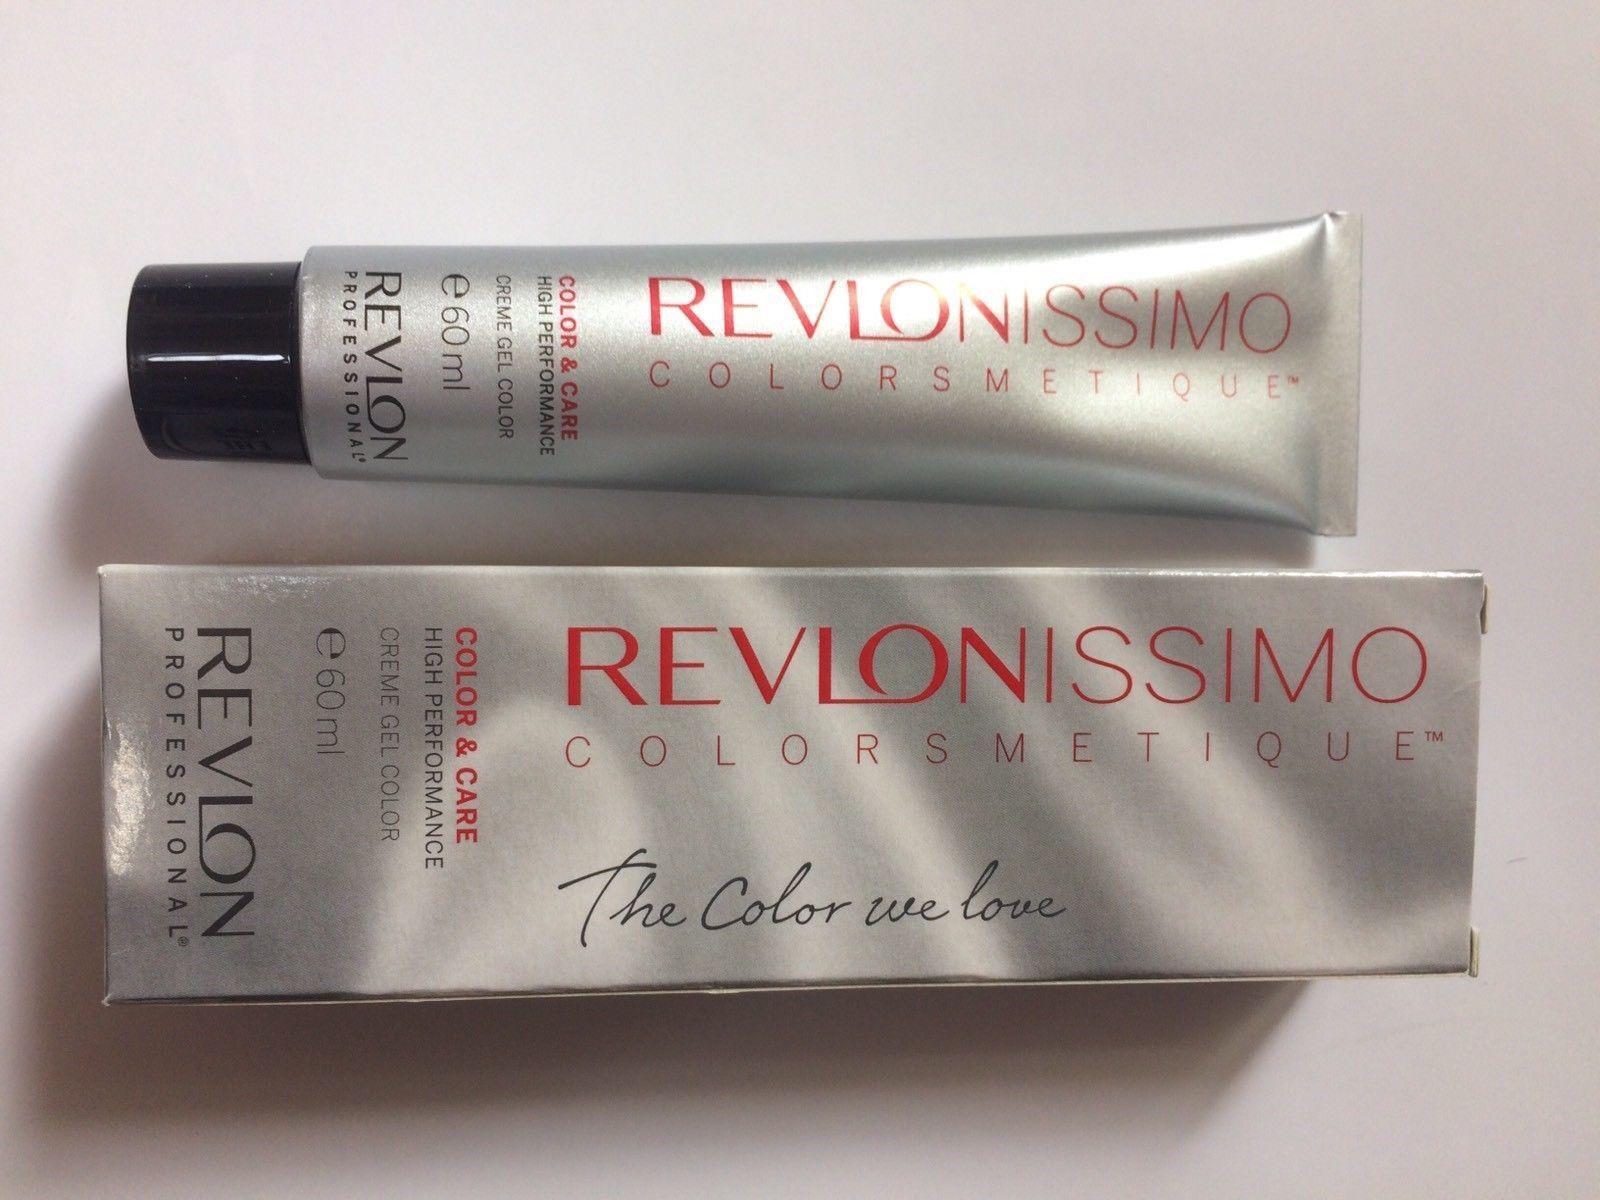 REVLON COLOR  60 ml Haarfarbe  Revlonissimo Gelcolor  8.04